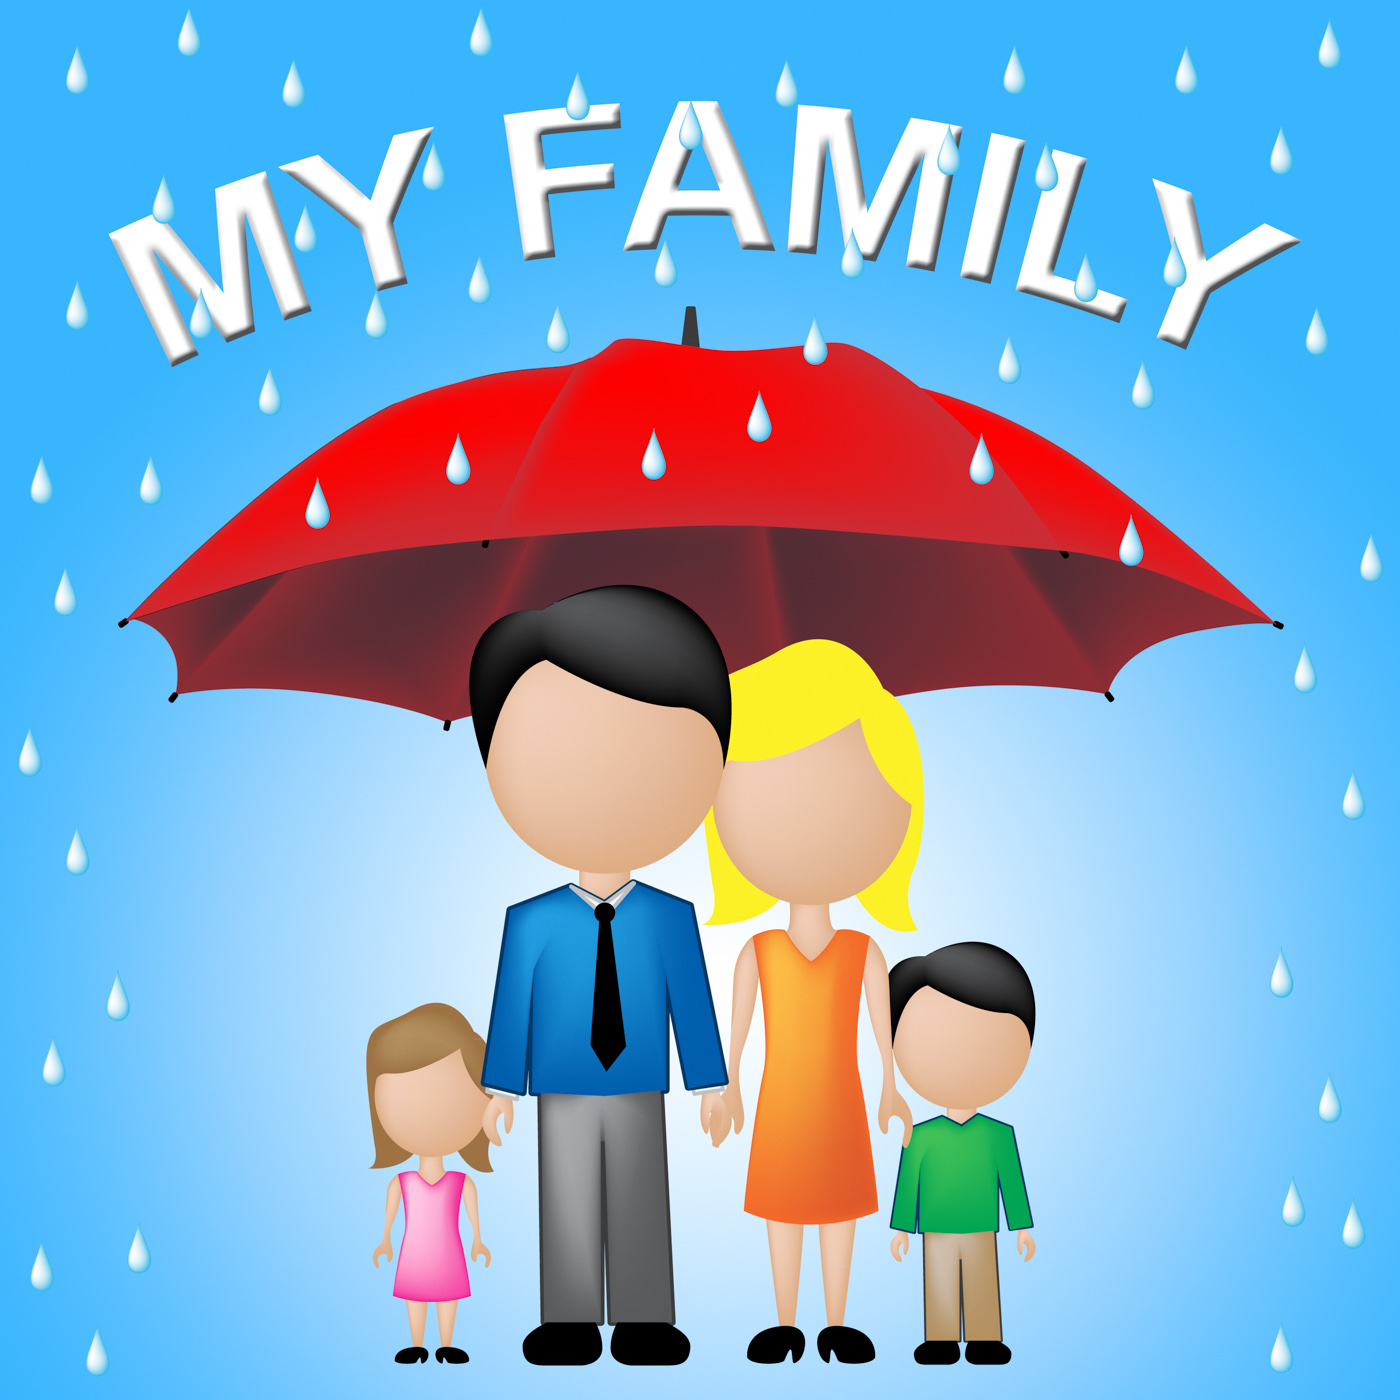 My family shows parasol umbrella and sibling photo